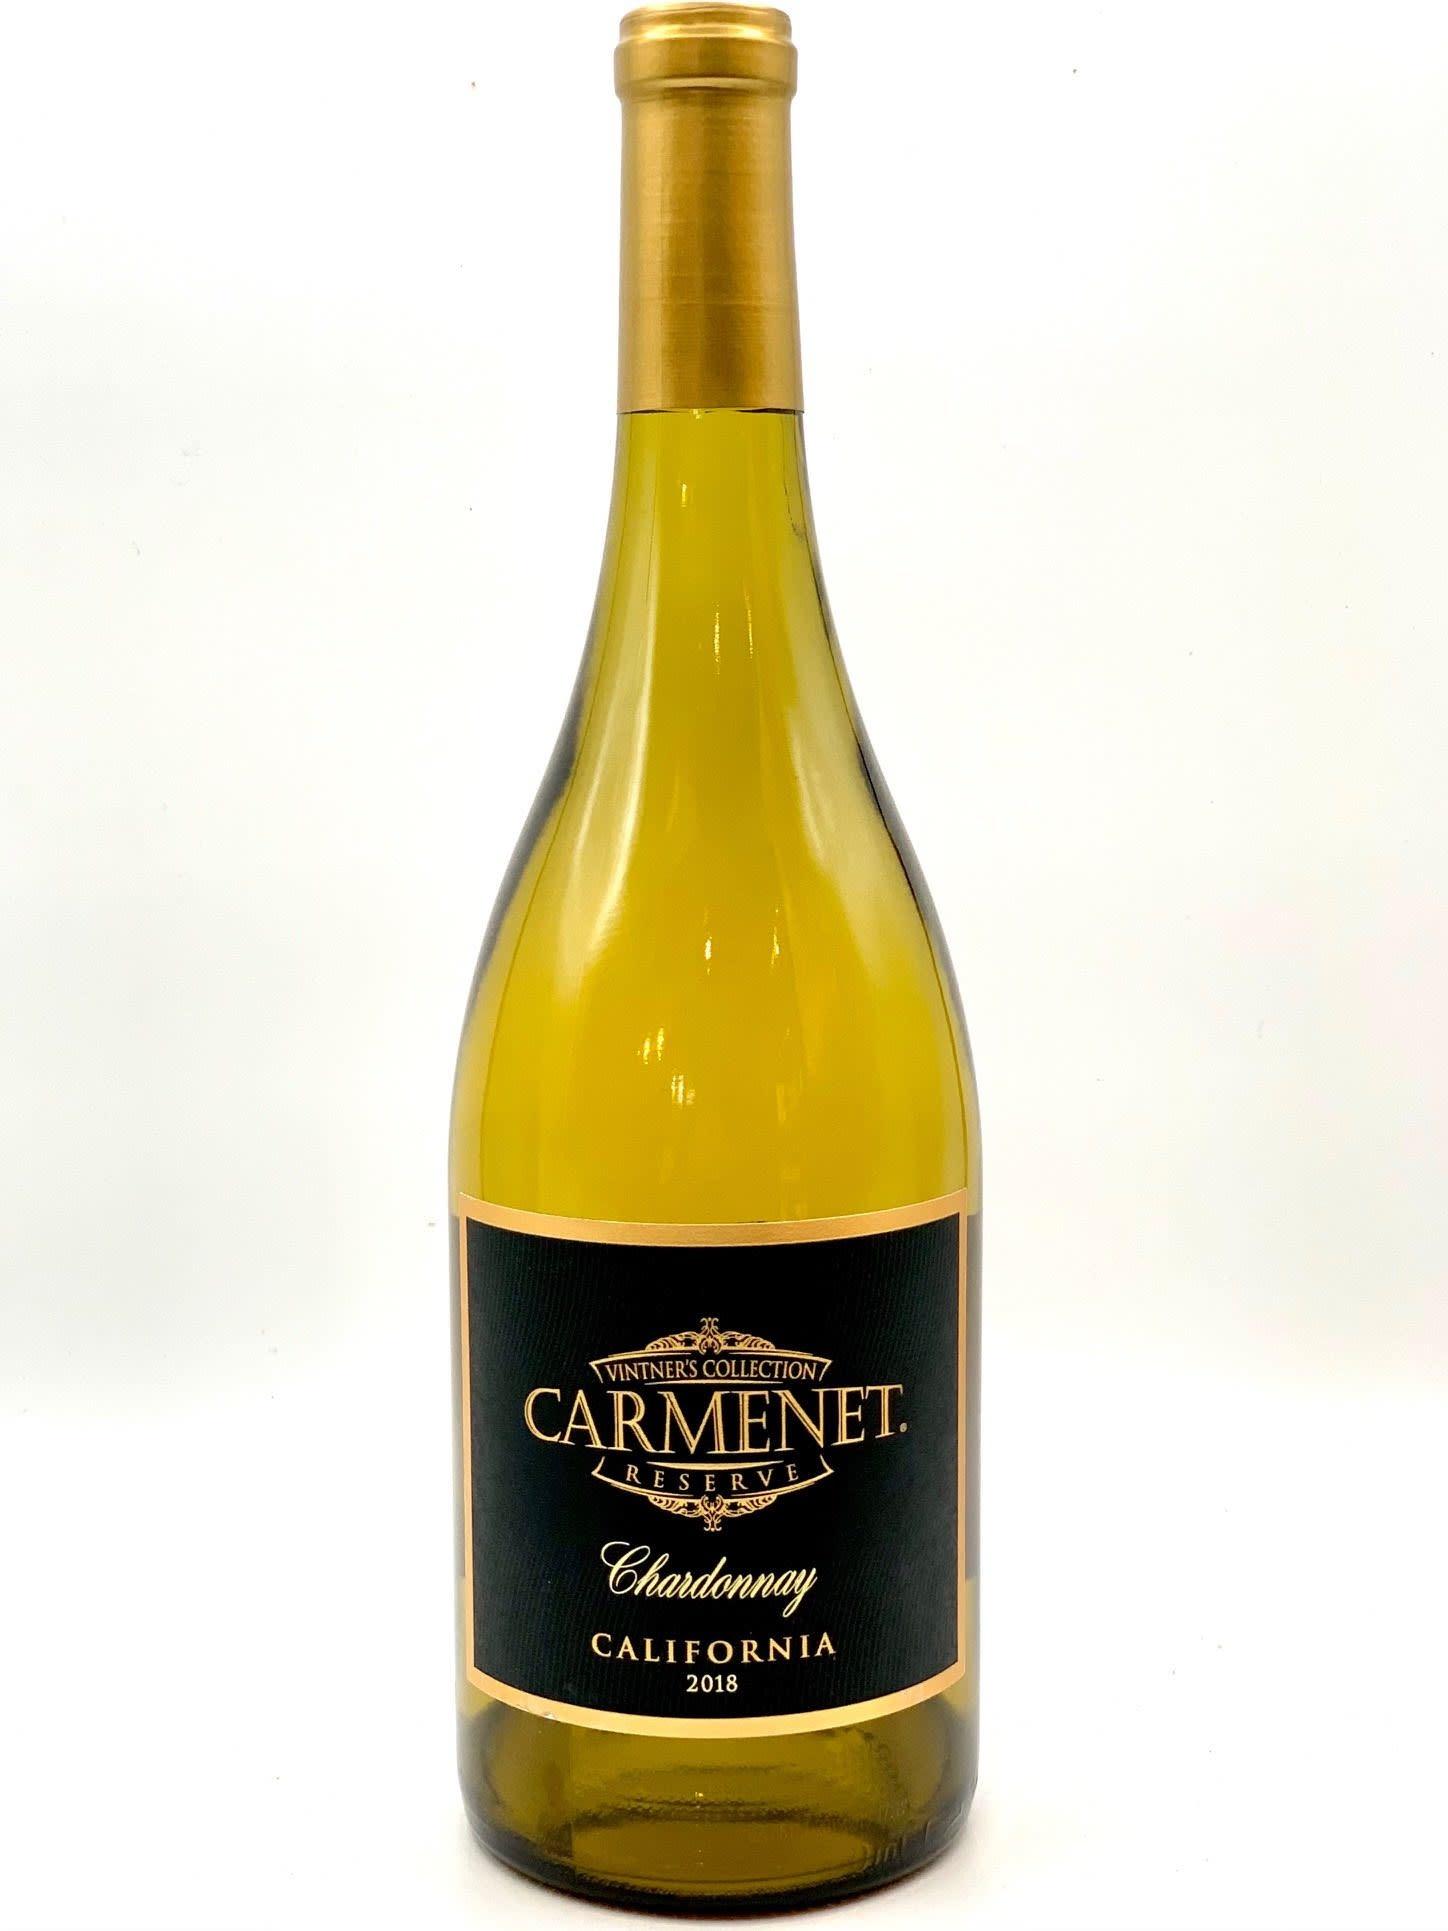 California Chardonnay 2018 Carmenet 750ml